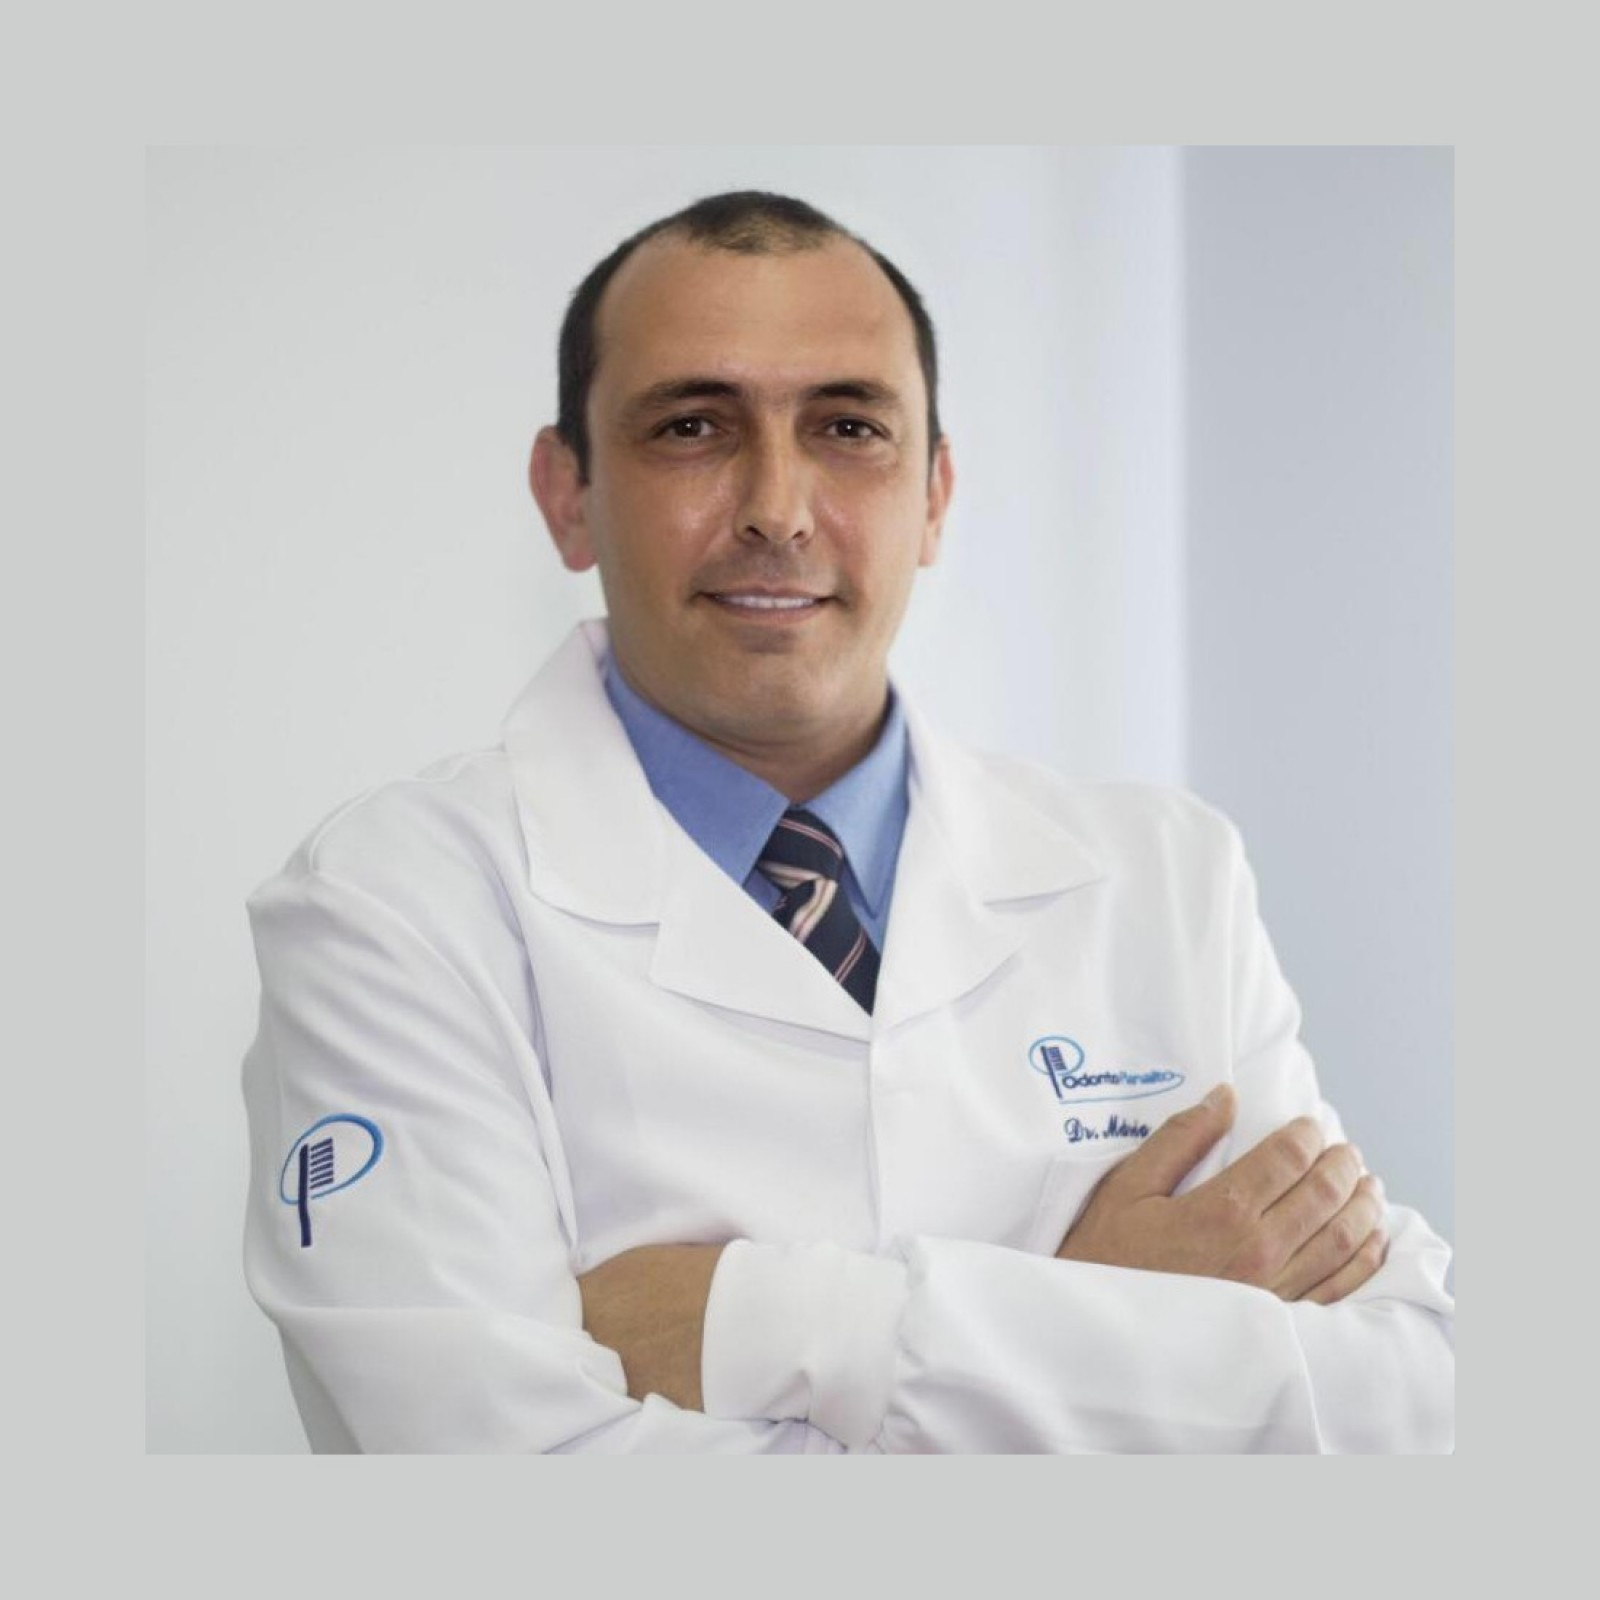 Prof. Mário Silveira - CRO/RS: 10.814